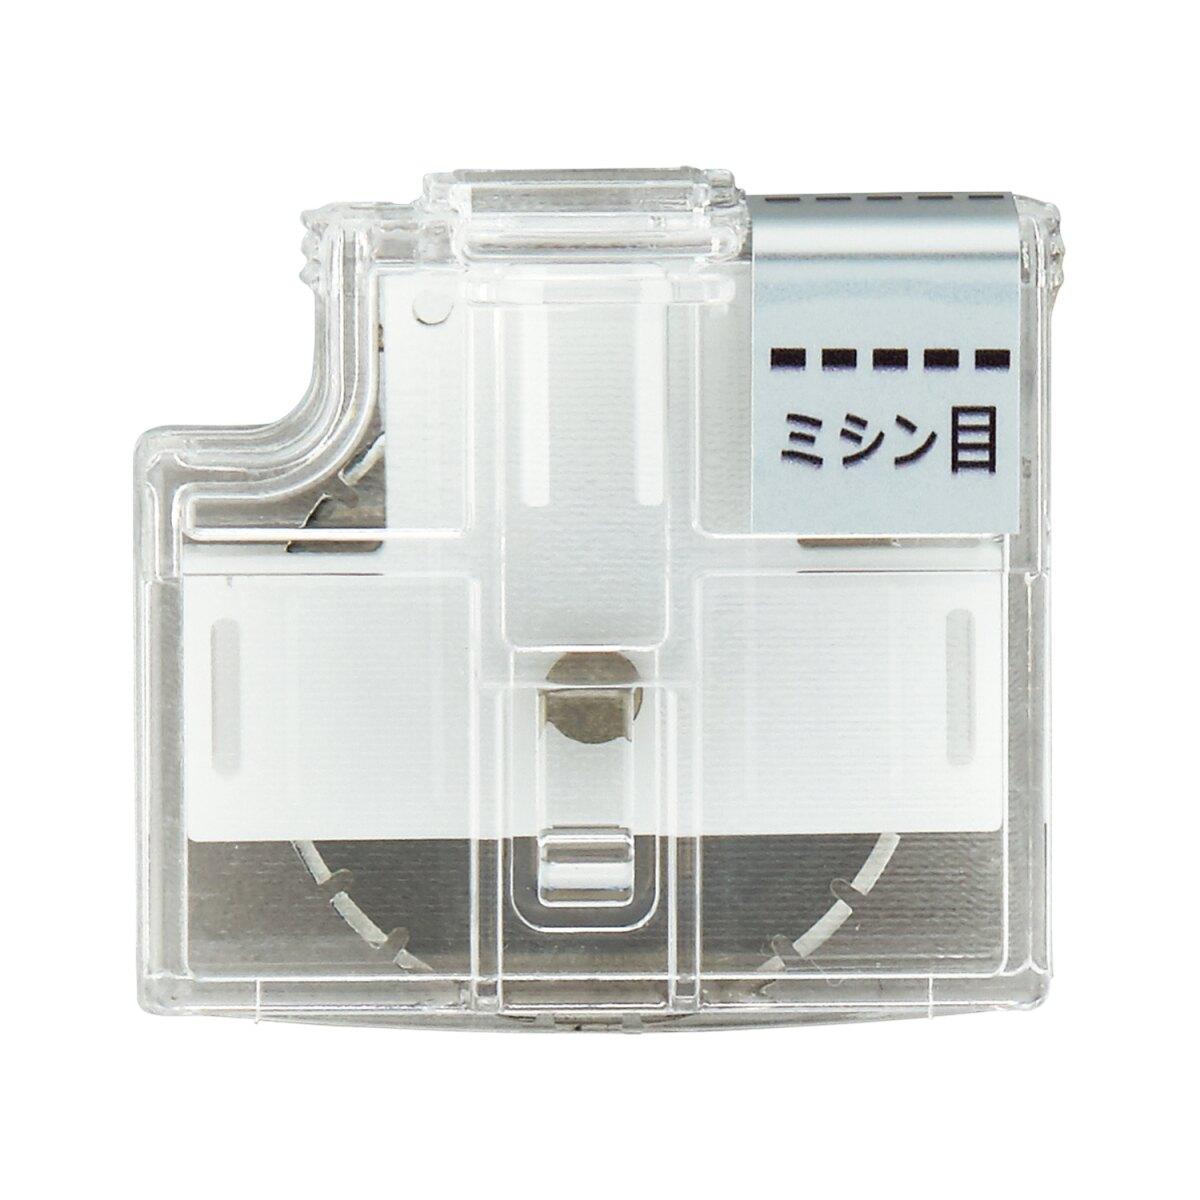 PLUS 普樂士 PK-813 裁紙機 專用虛線替換刀 (26-475) (PK-800H2)